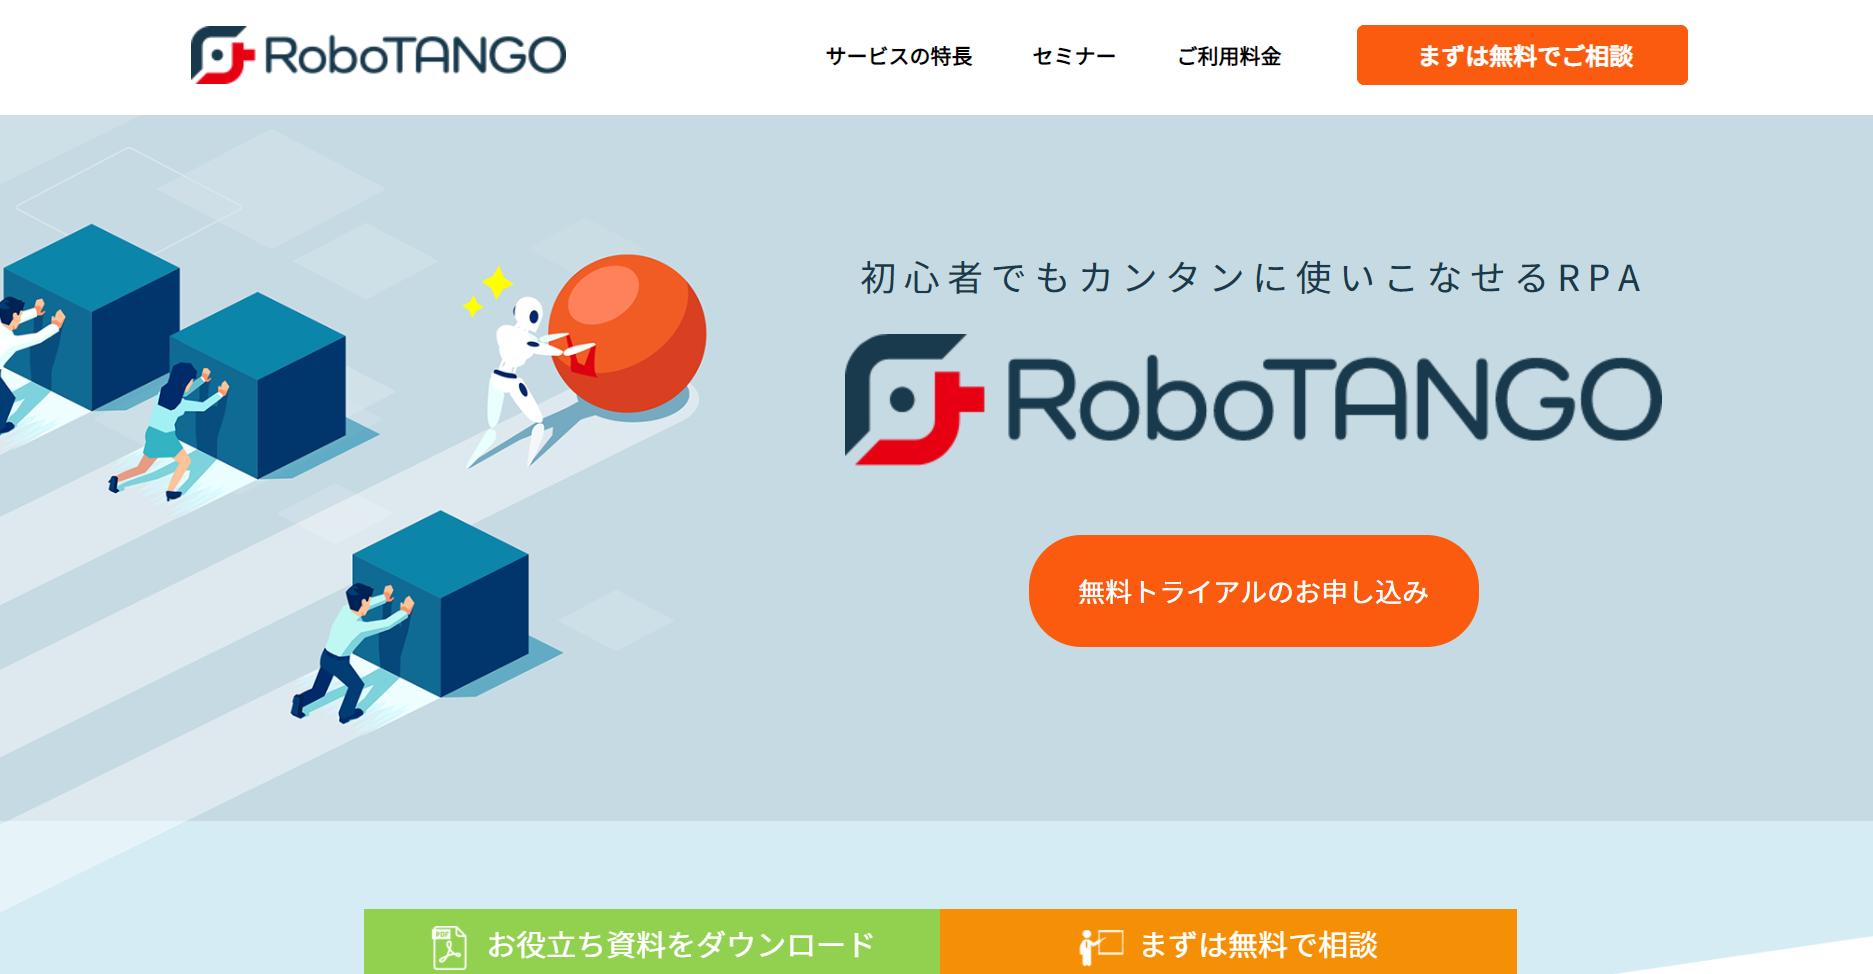 RoboTANGO 公式Webサイト